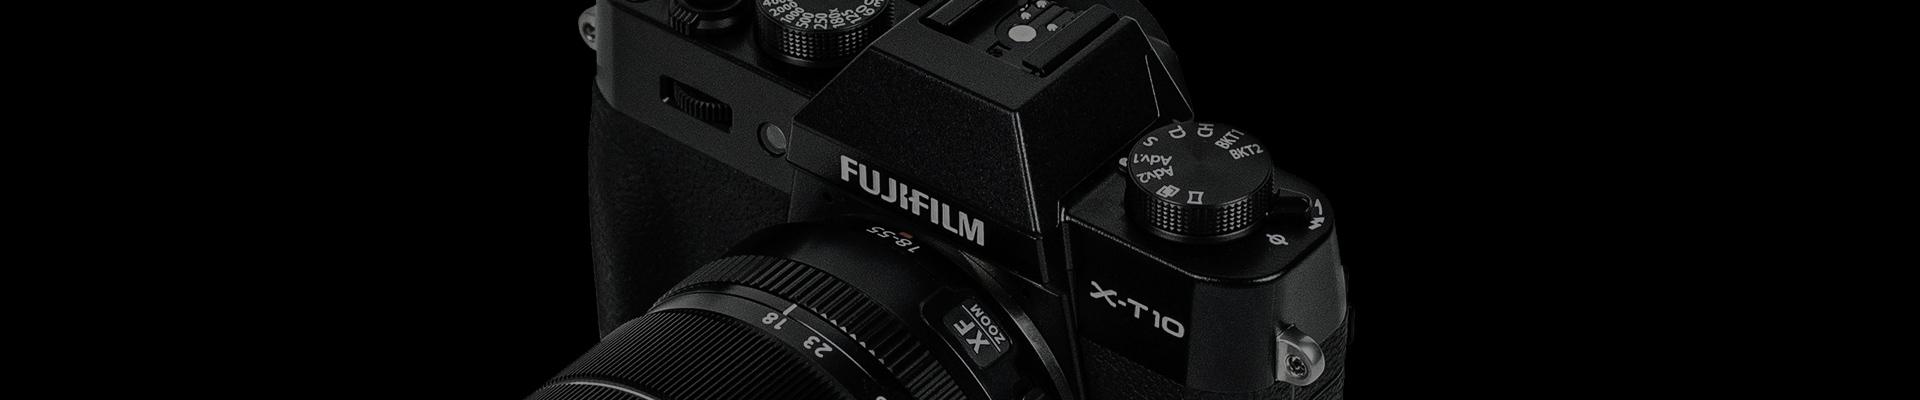 fuji-brand-page.jpg